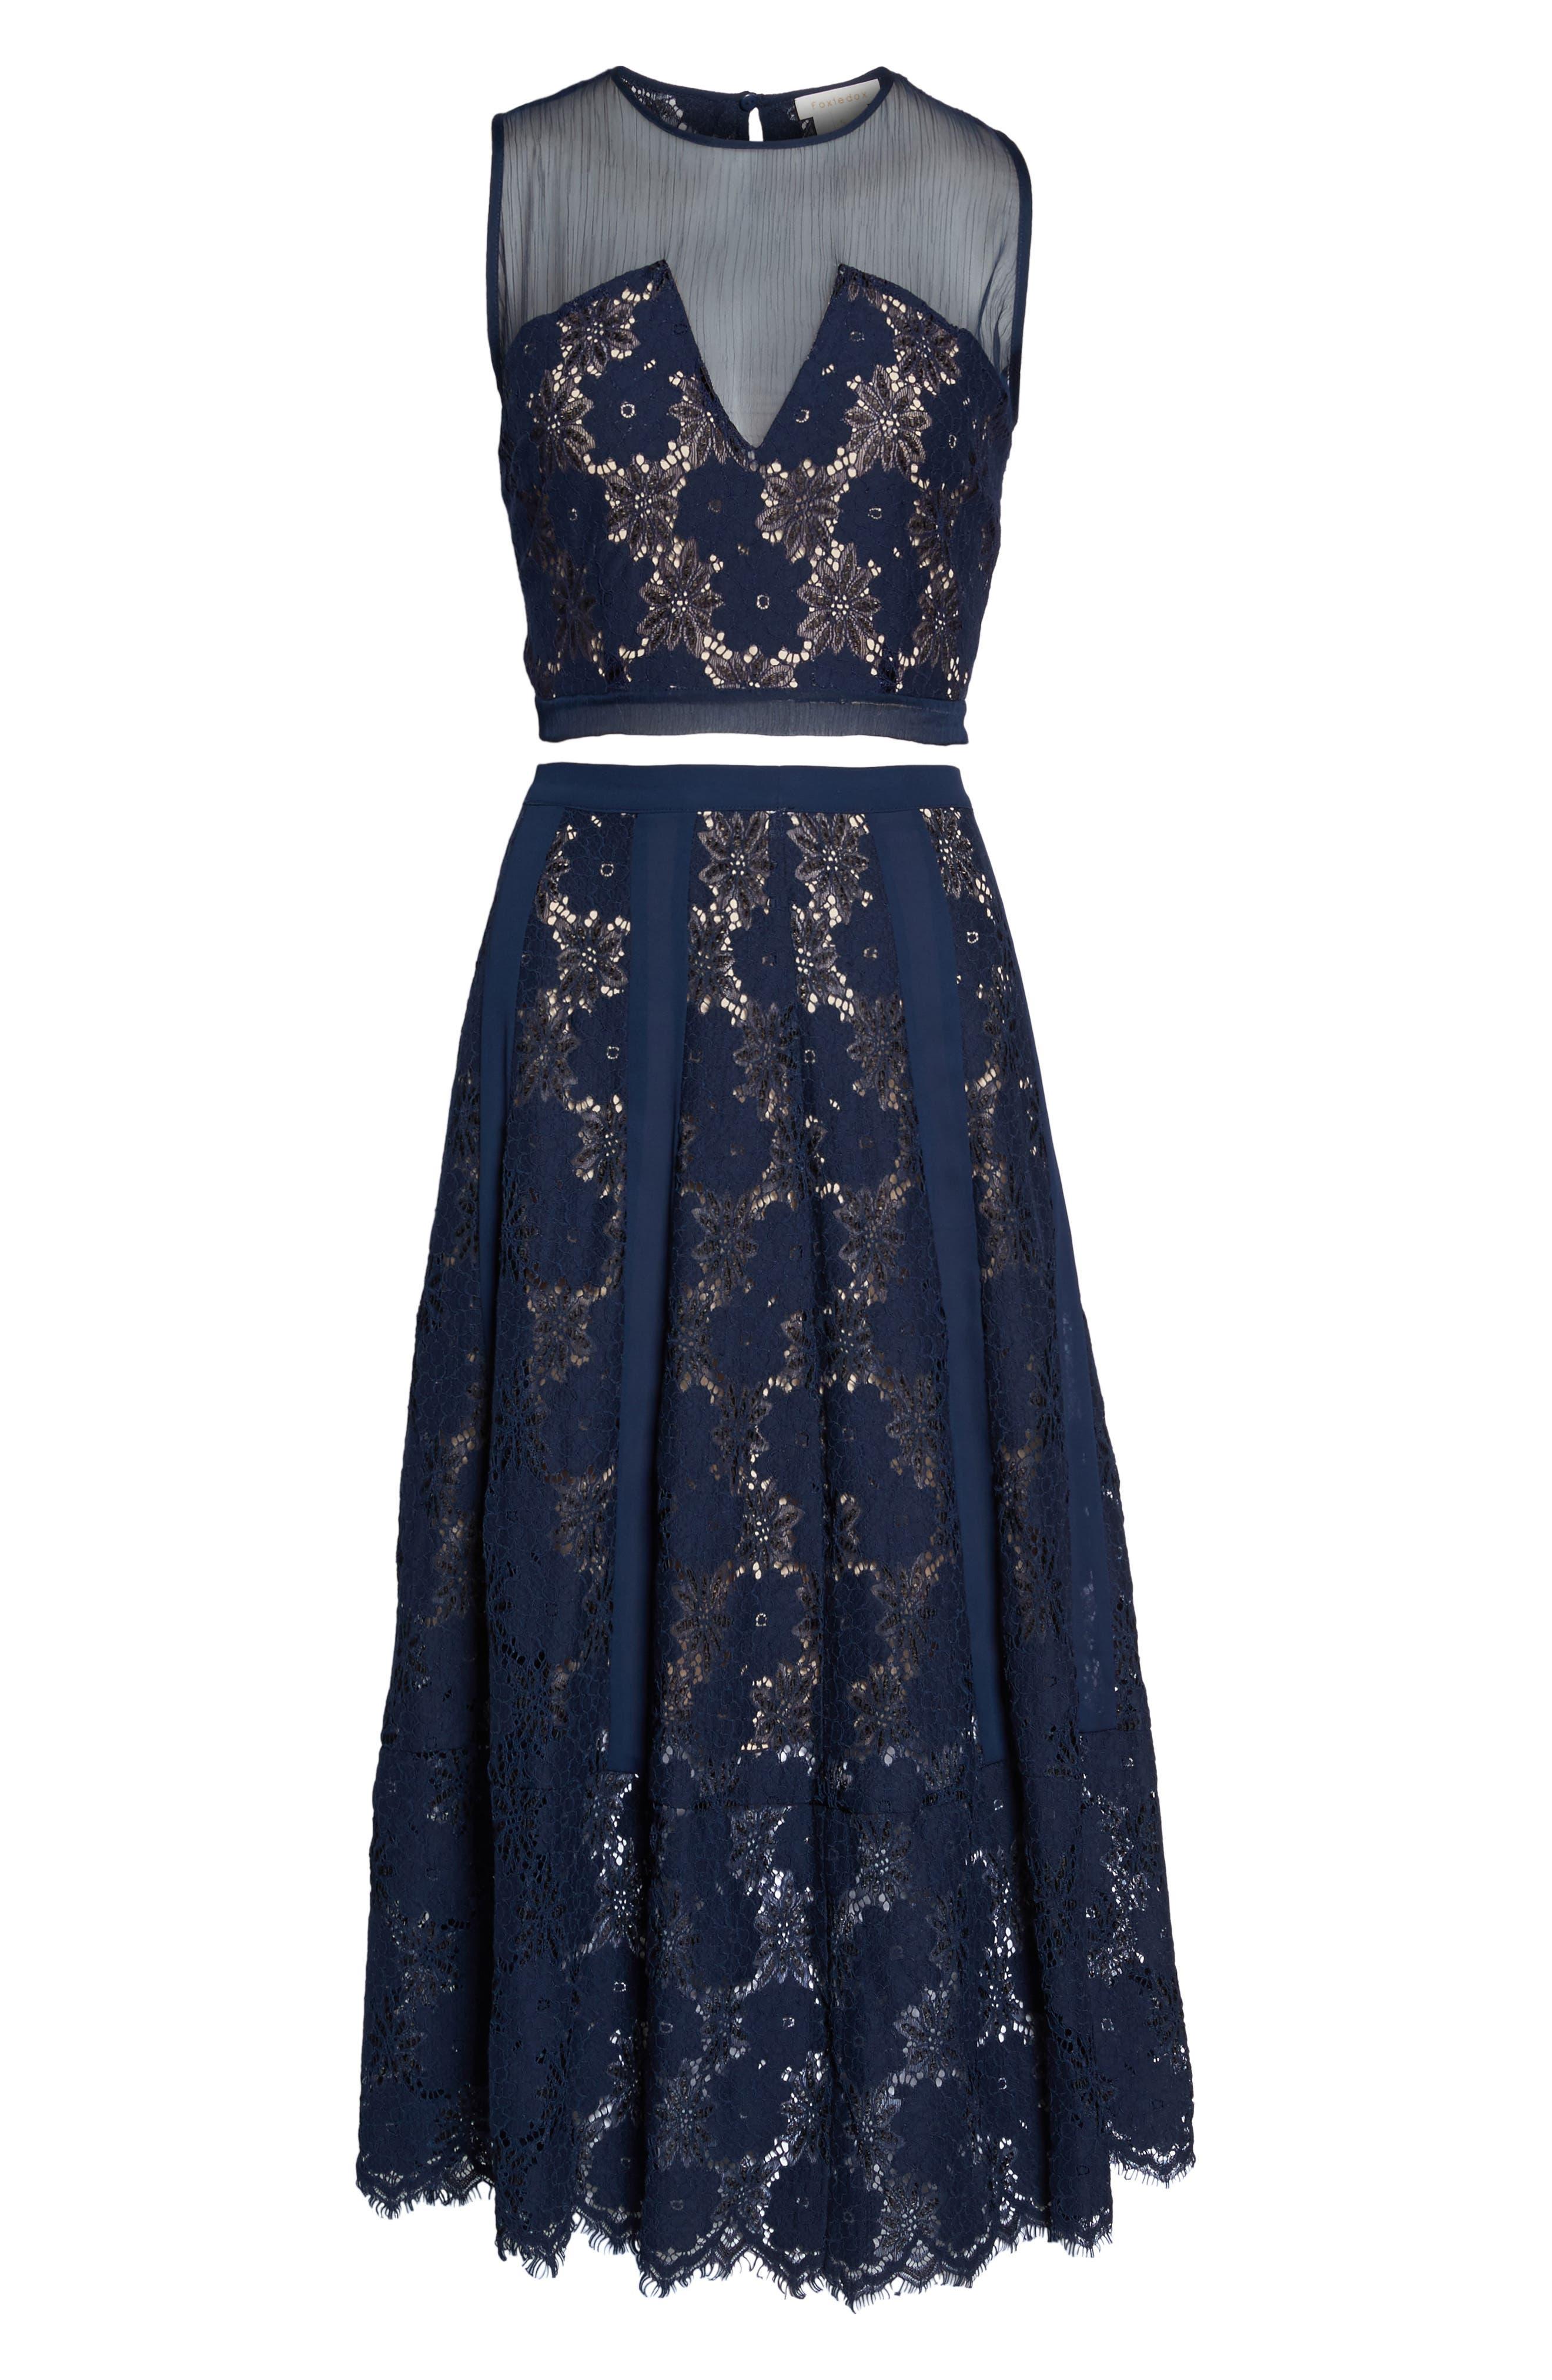 Atiqah Two-Piece Dress,                             Alternate thumbnail 6, color,                             Navy